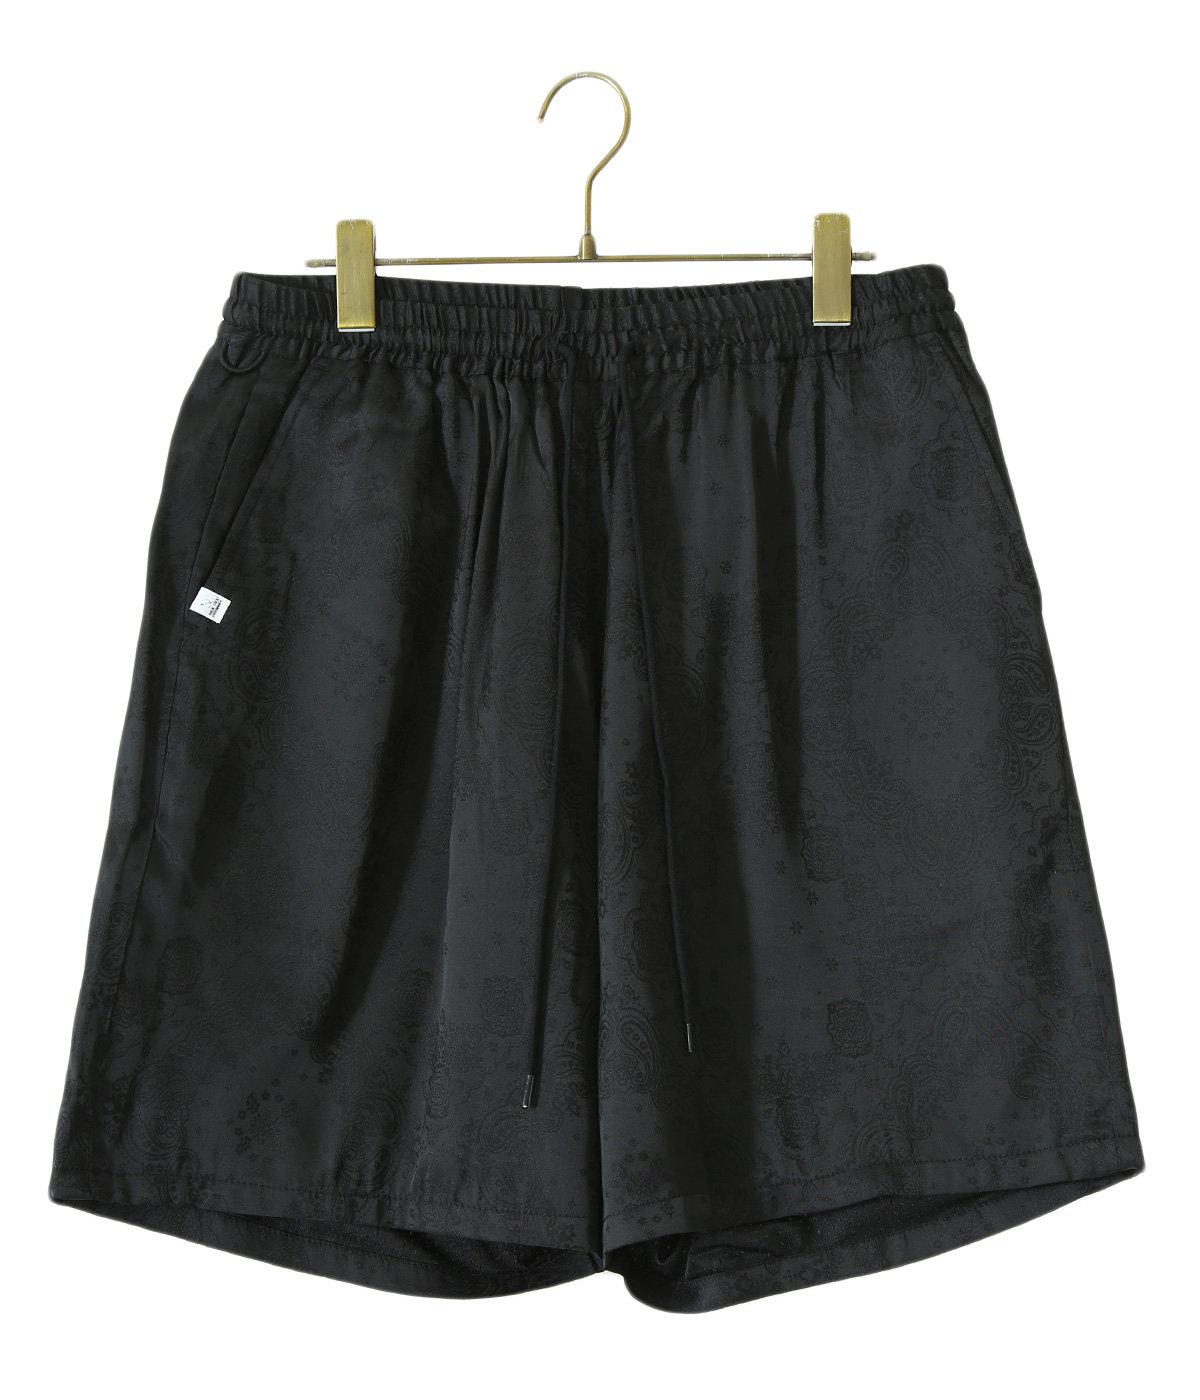 【ONLY ARK】別注 Black Paisley EZ shorts